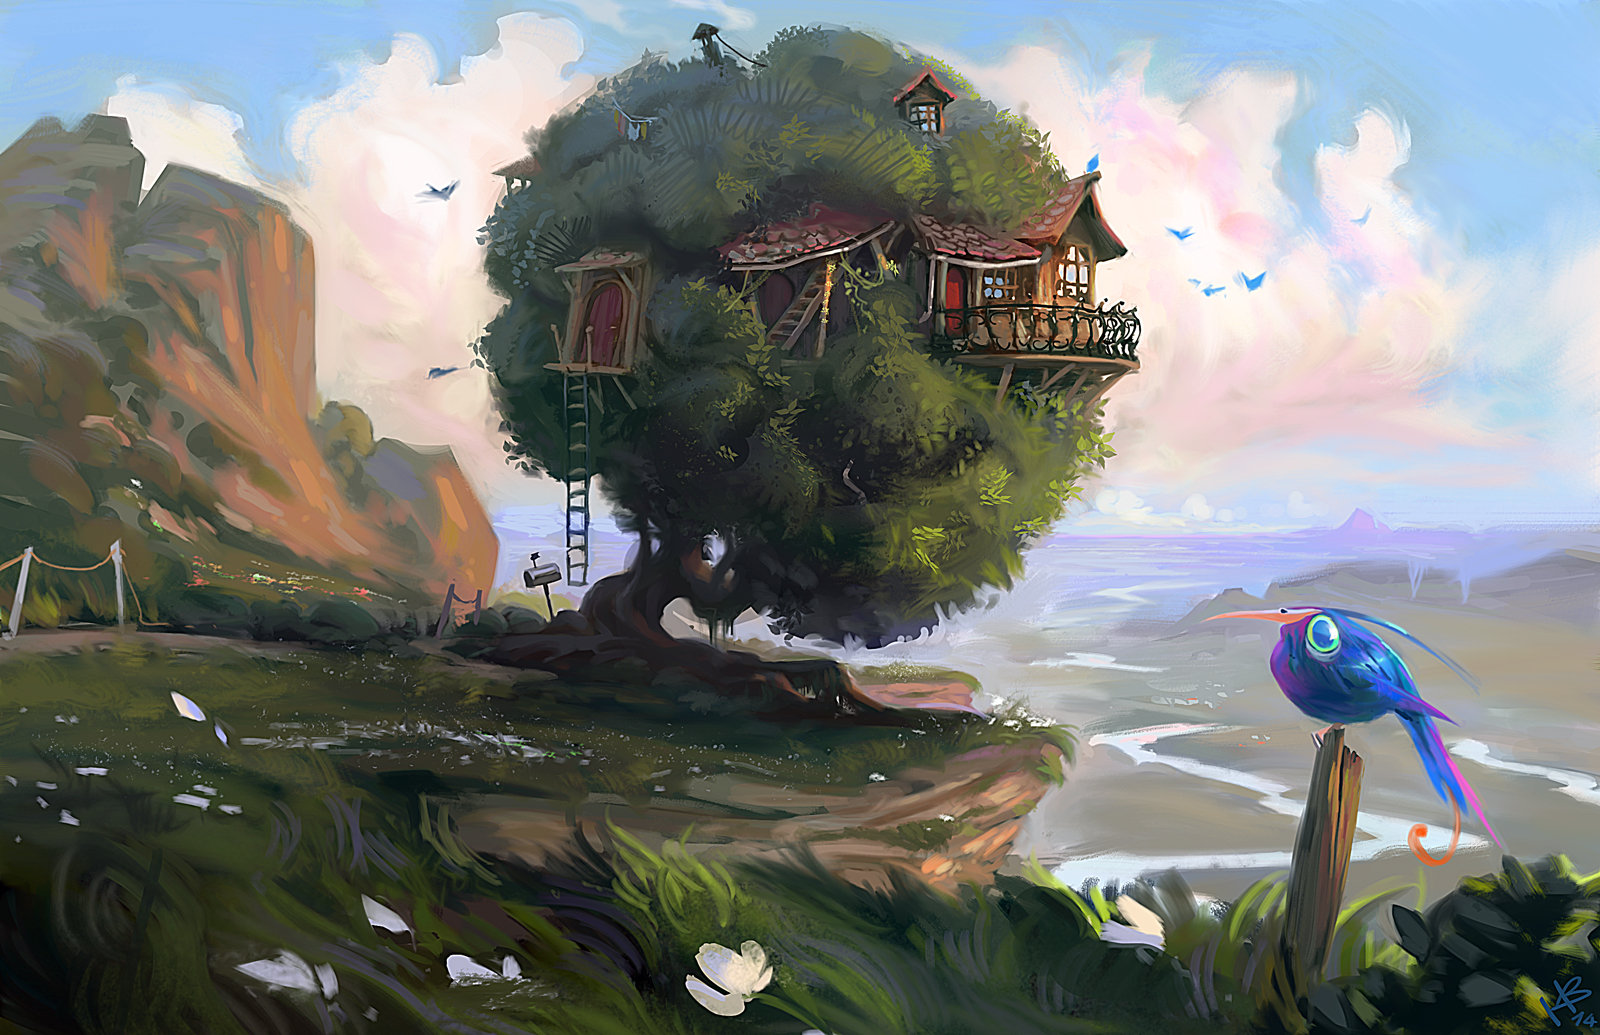 Treehaus2